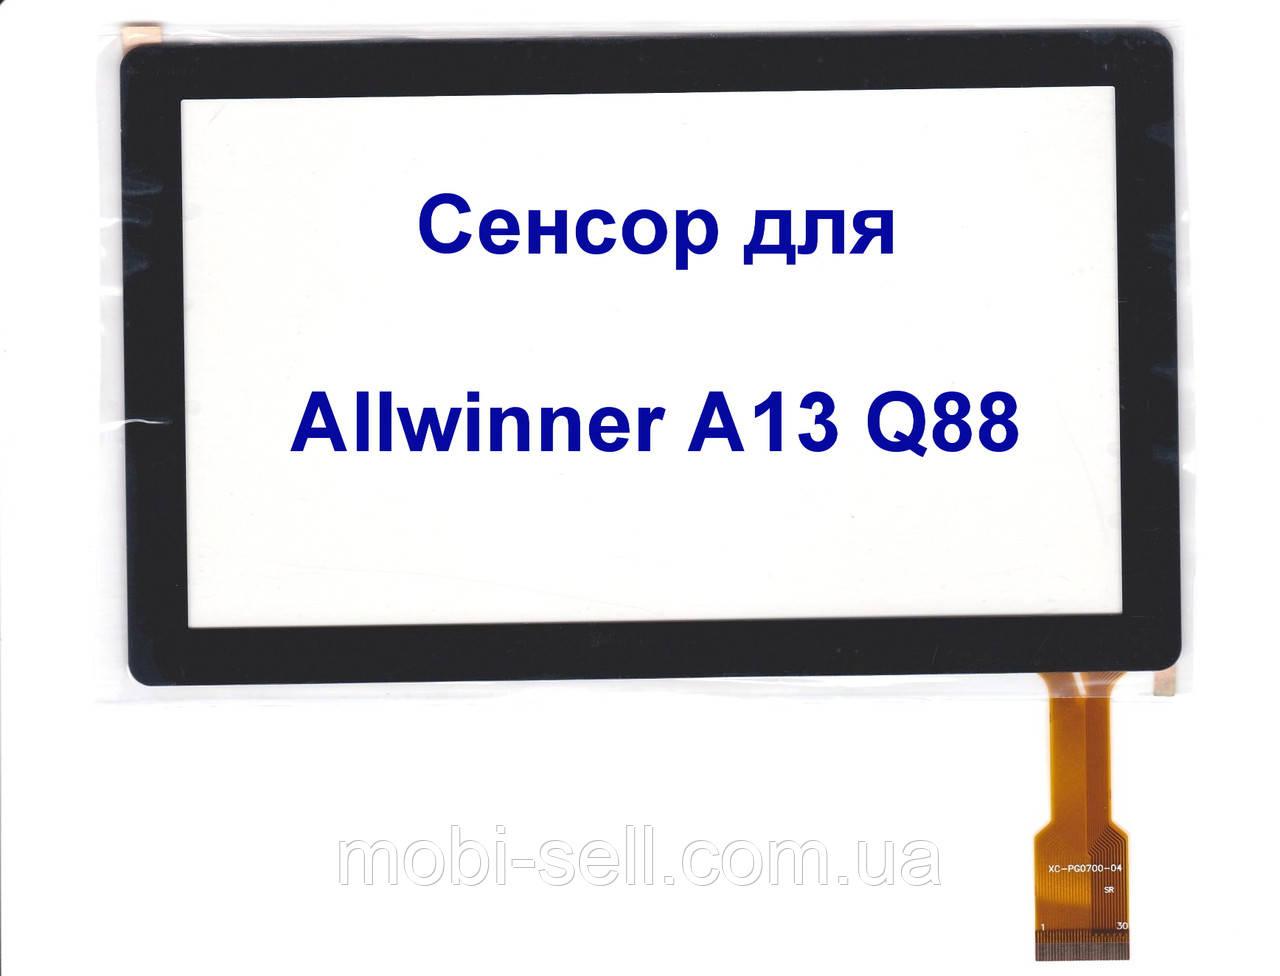 Сенсорный экран для планшета AllWinner A13 Q88